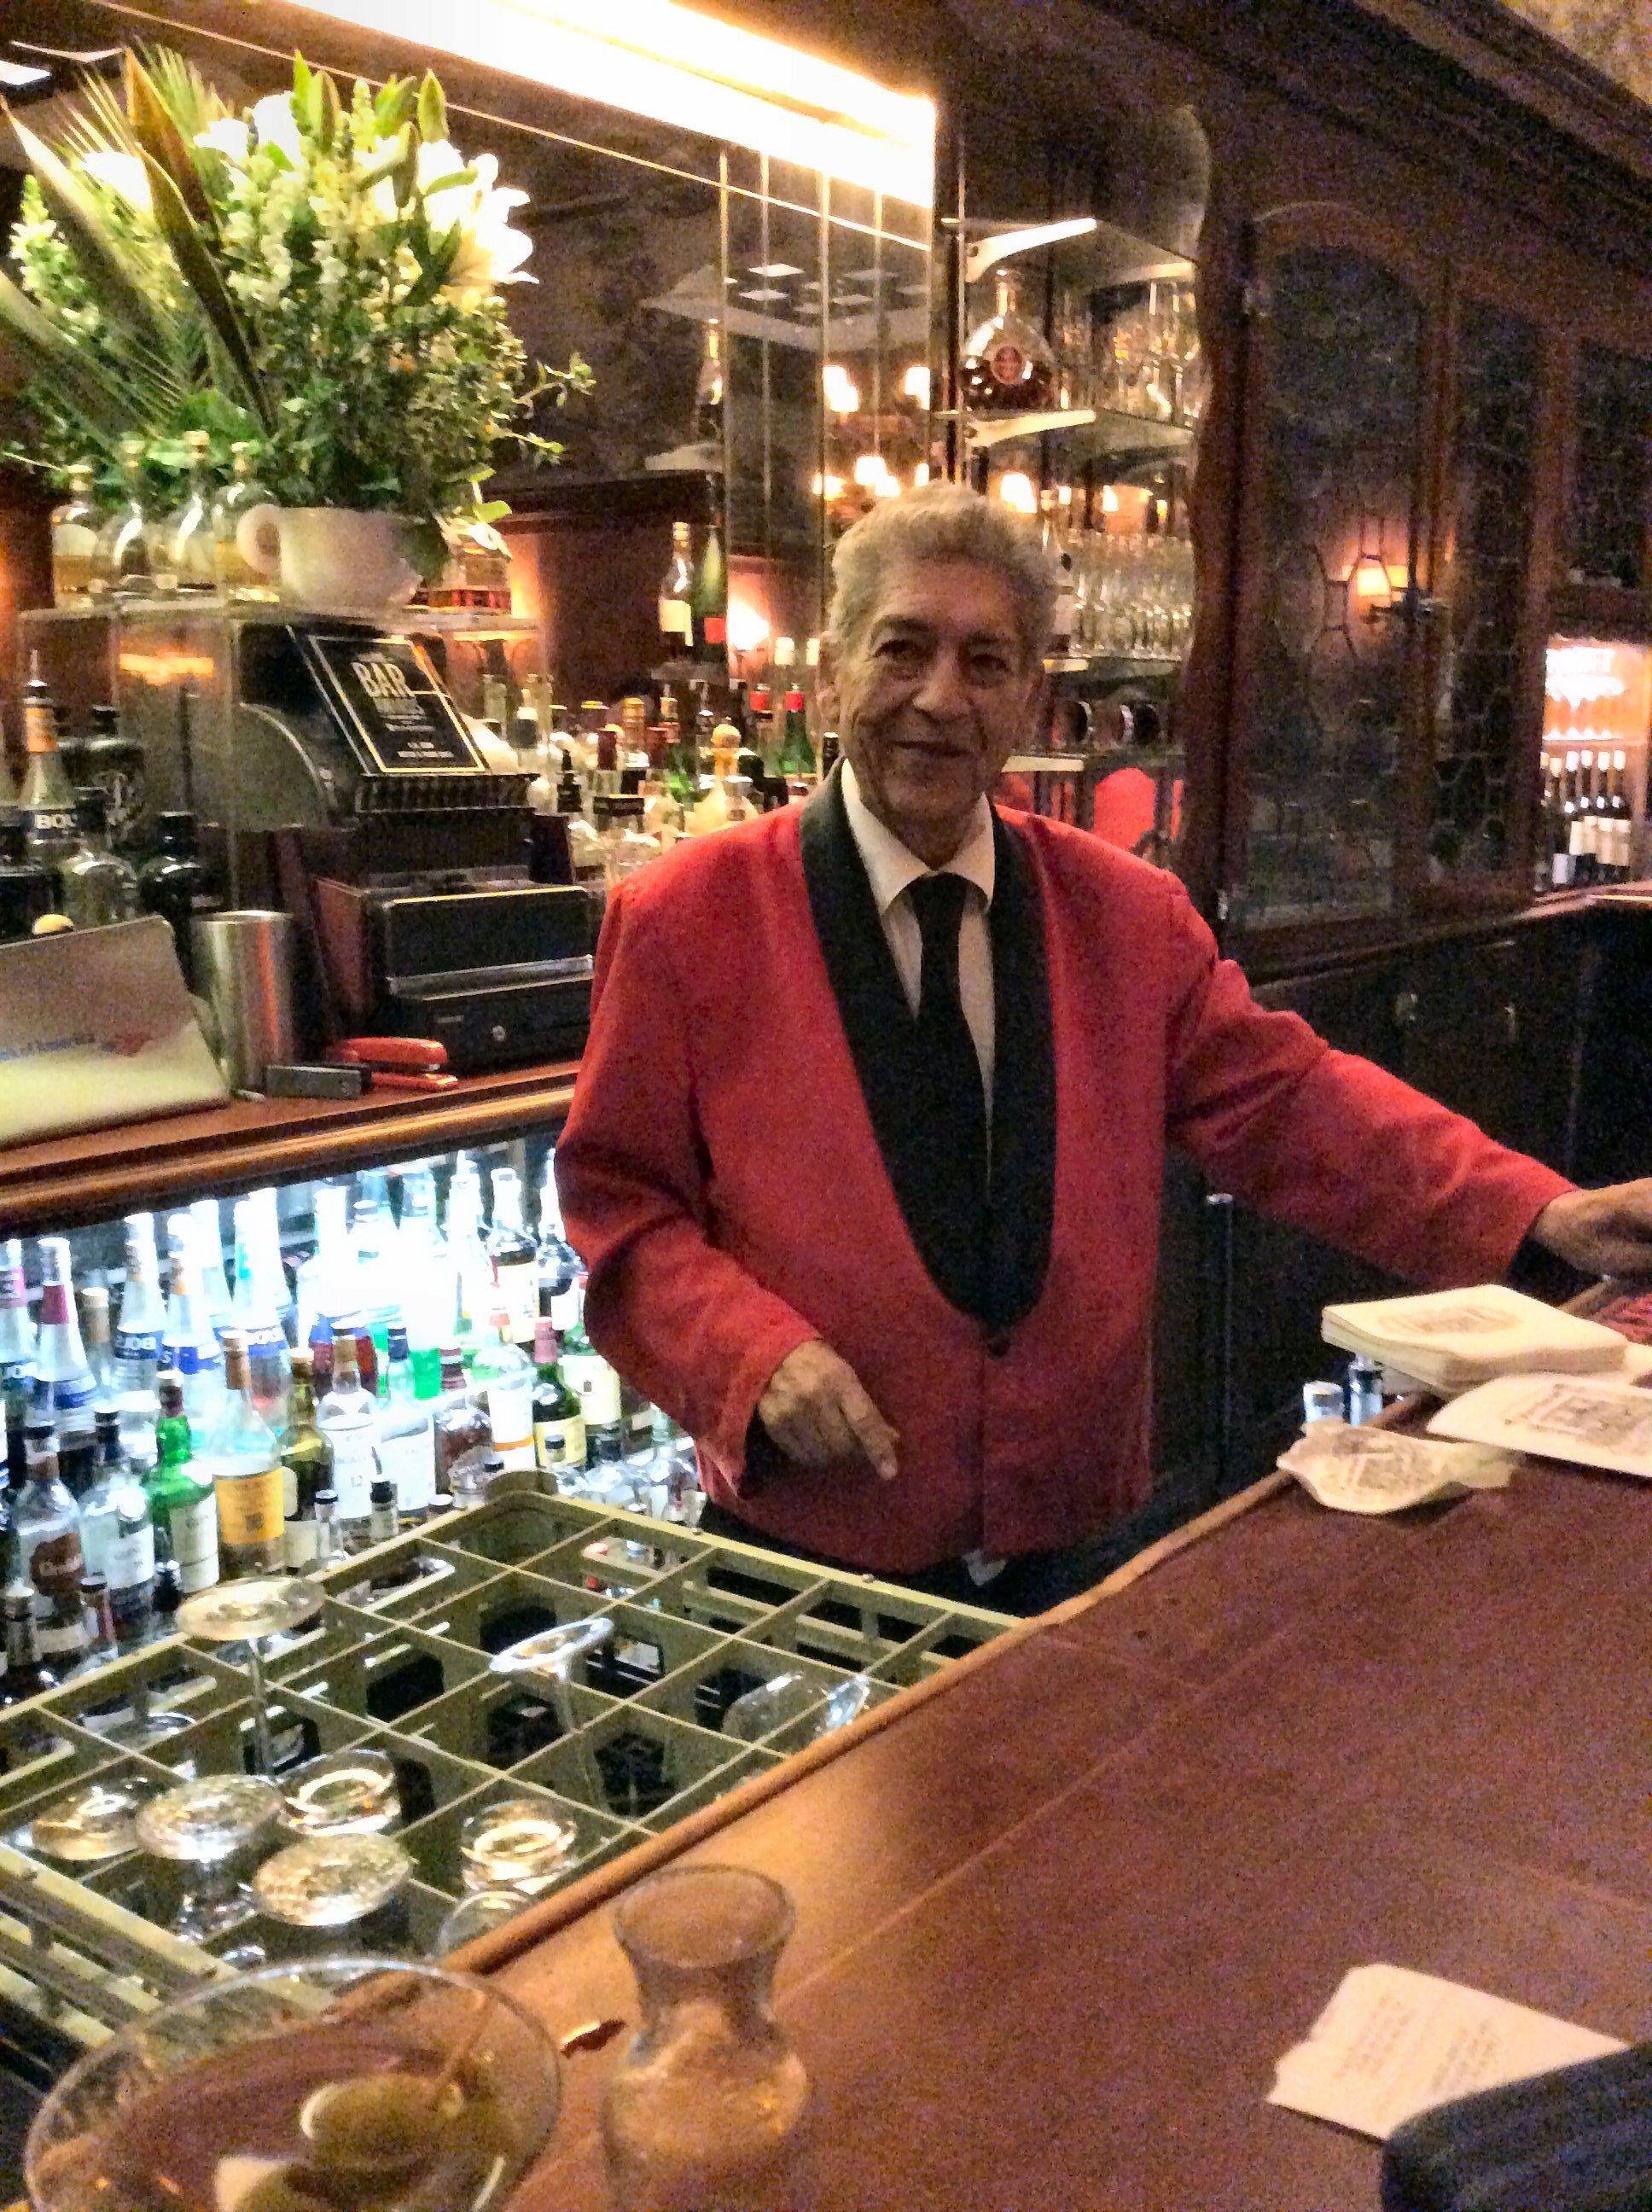 Ruben Rueda the bartender